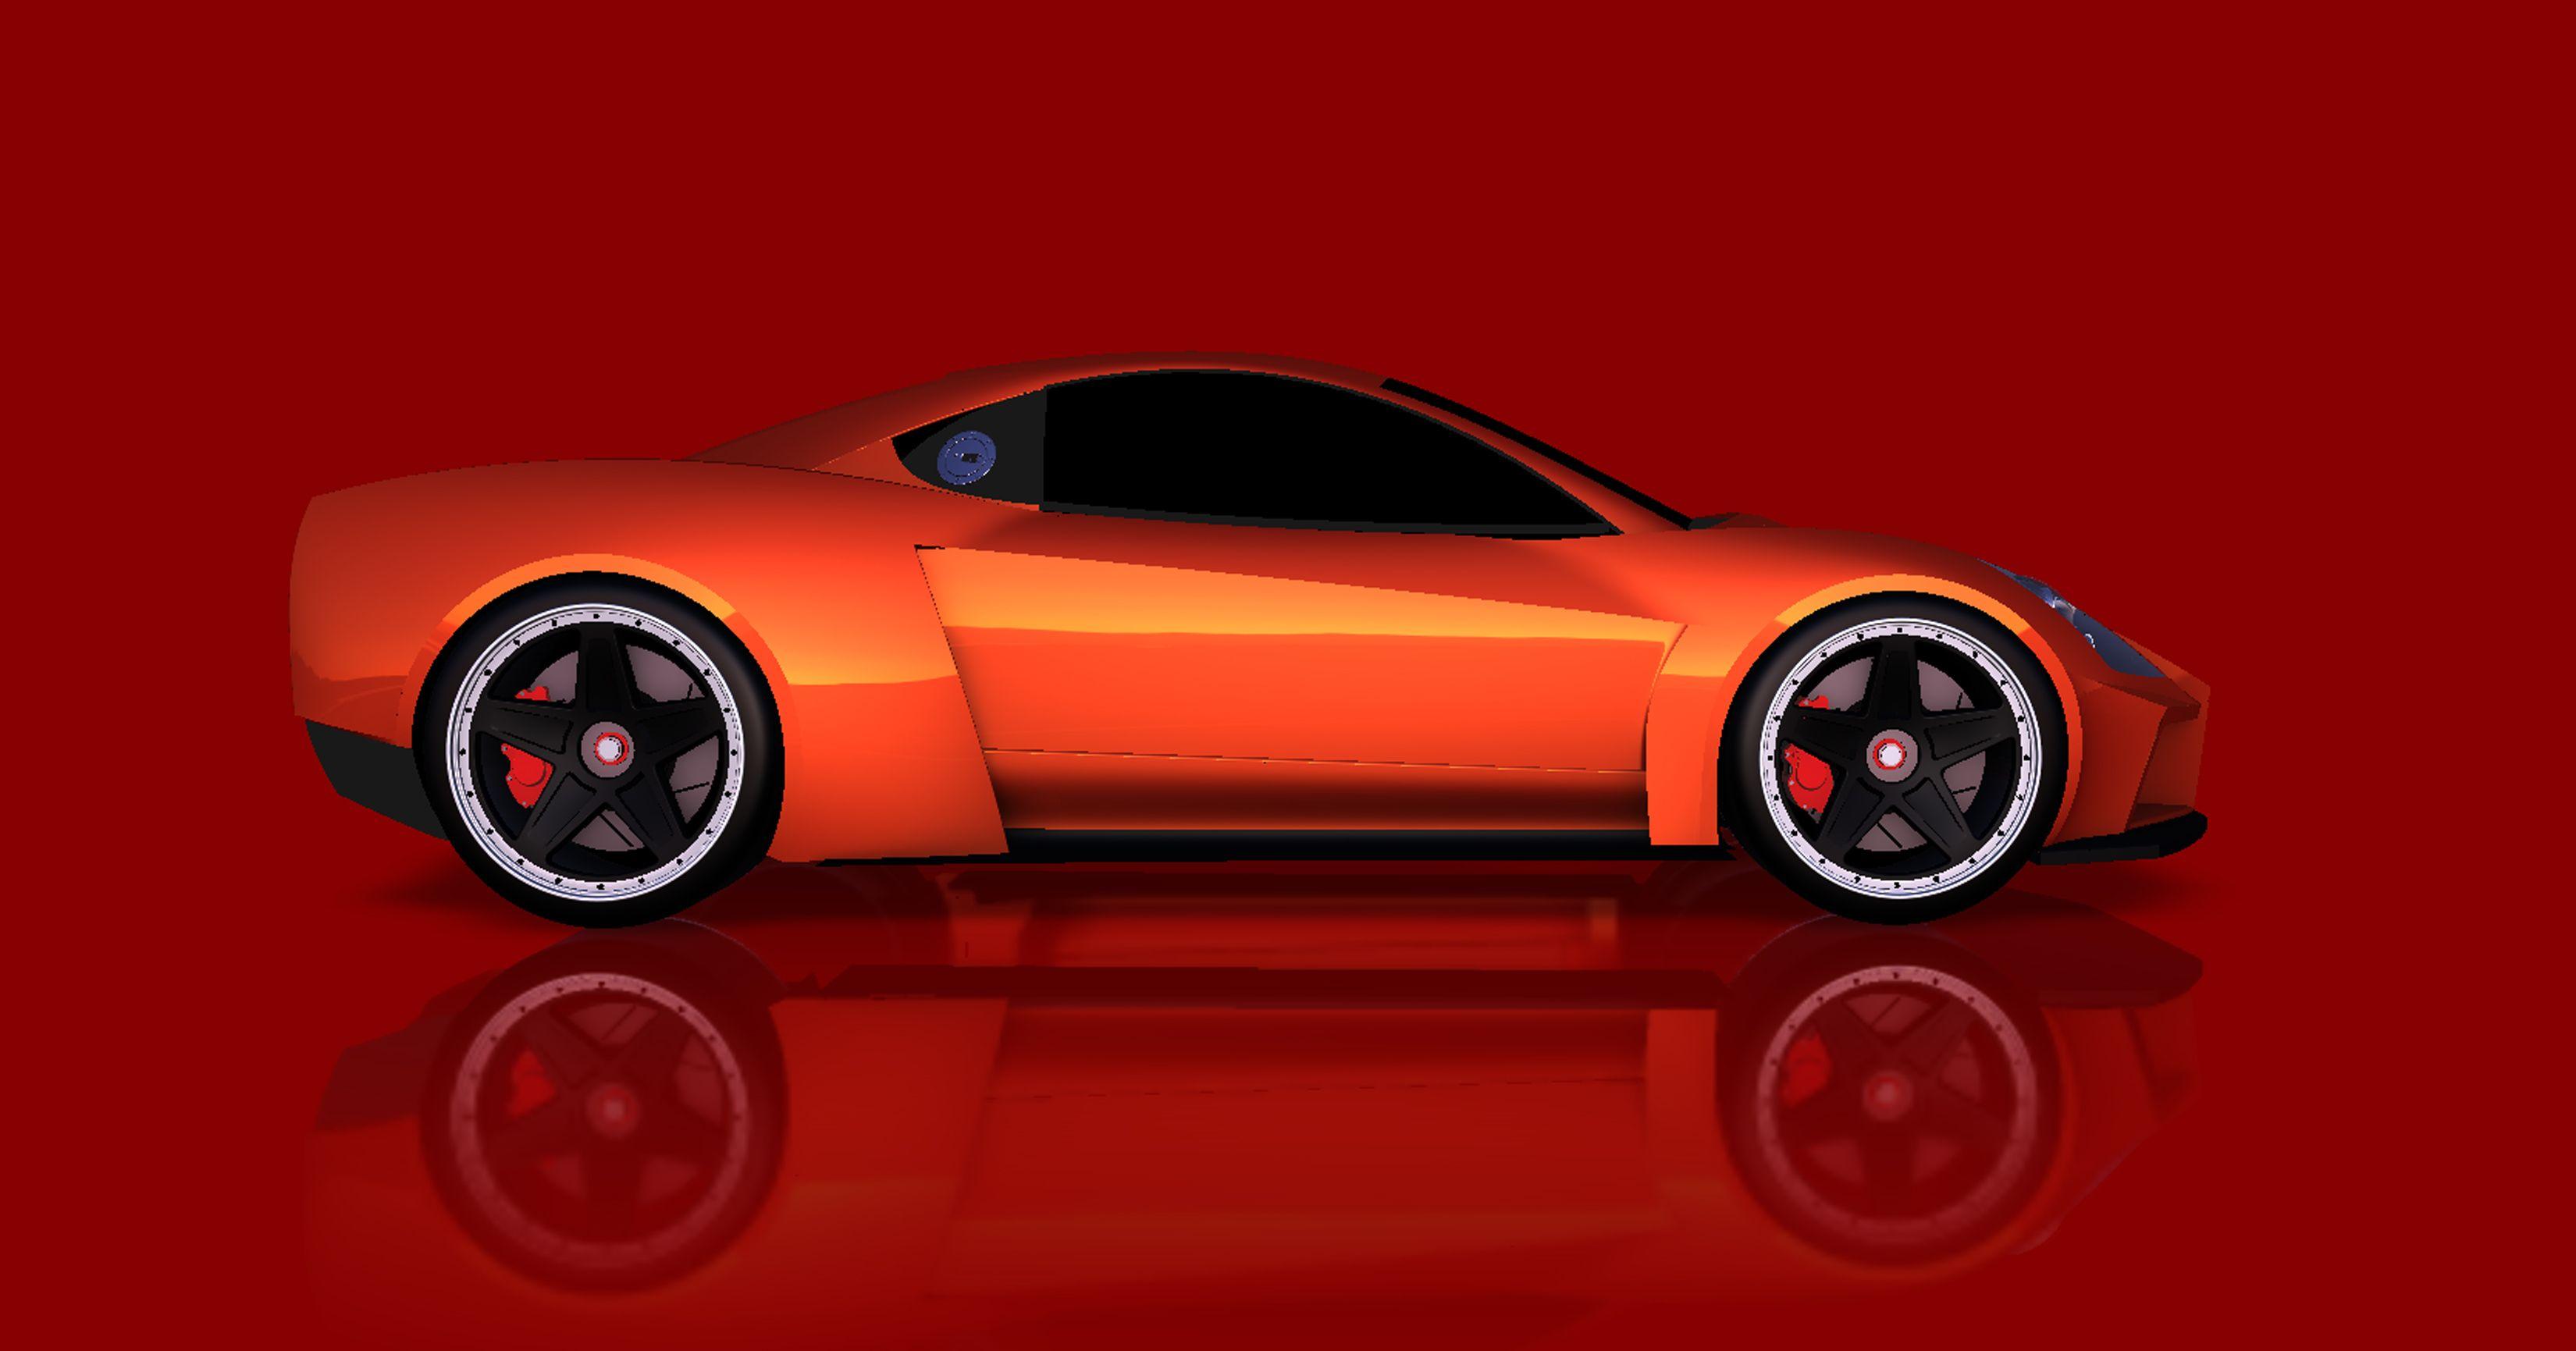 Apex- by superlite cars (kit mnfr) Race car replicas builds better ...